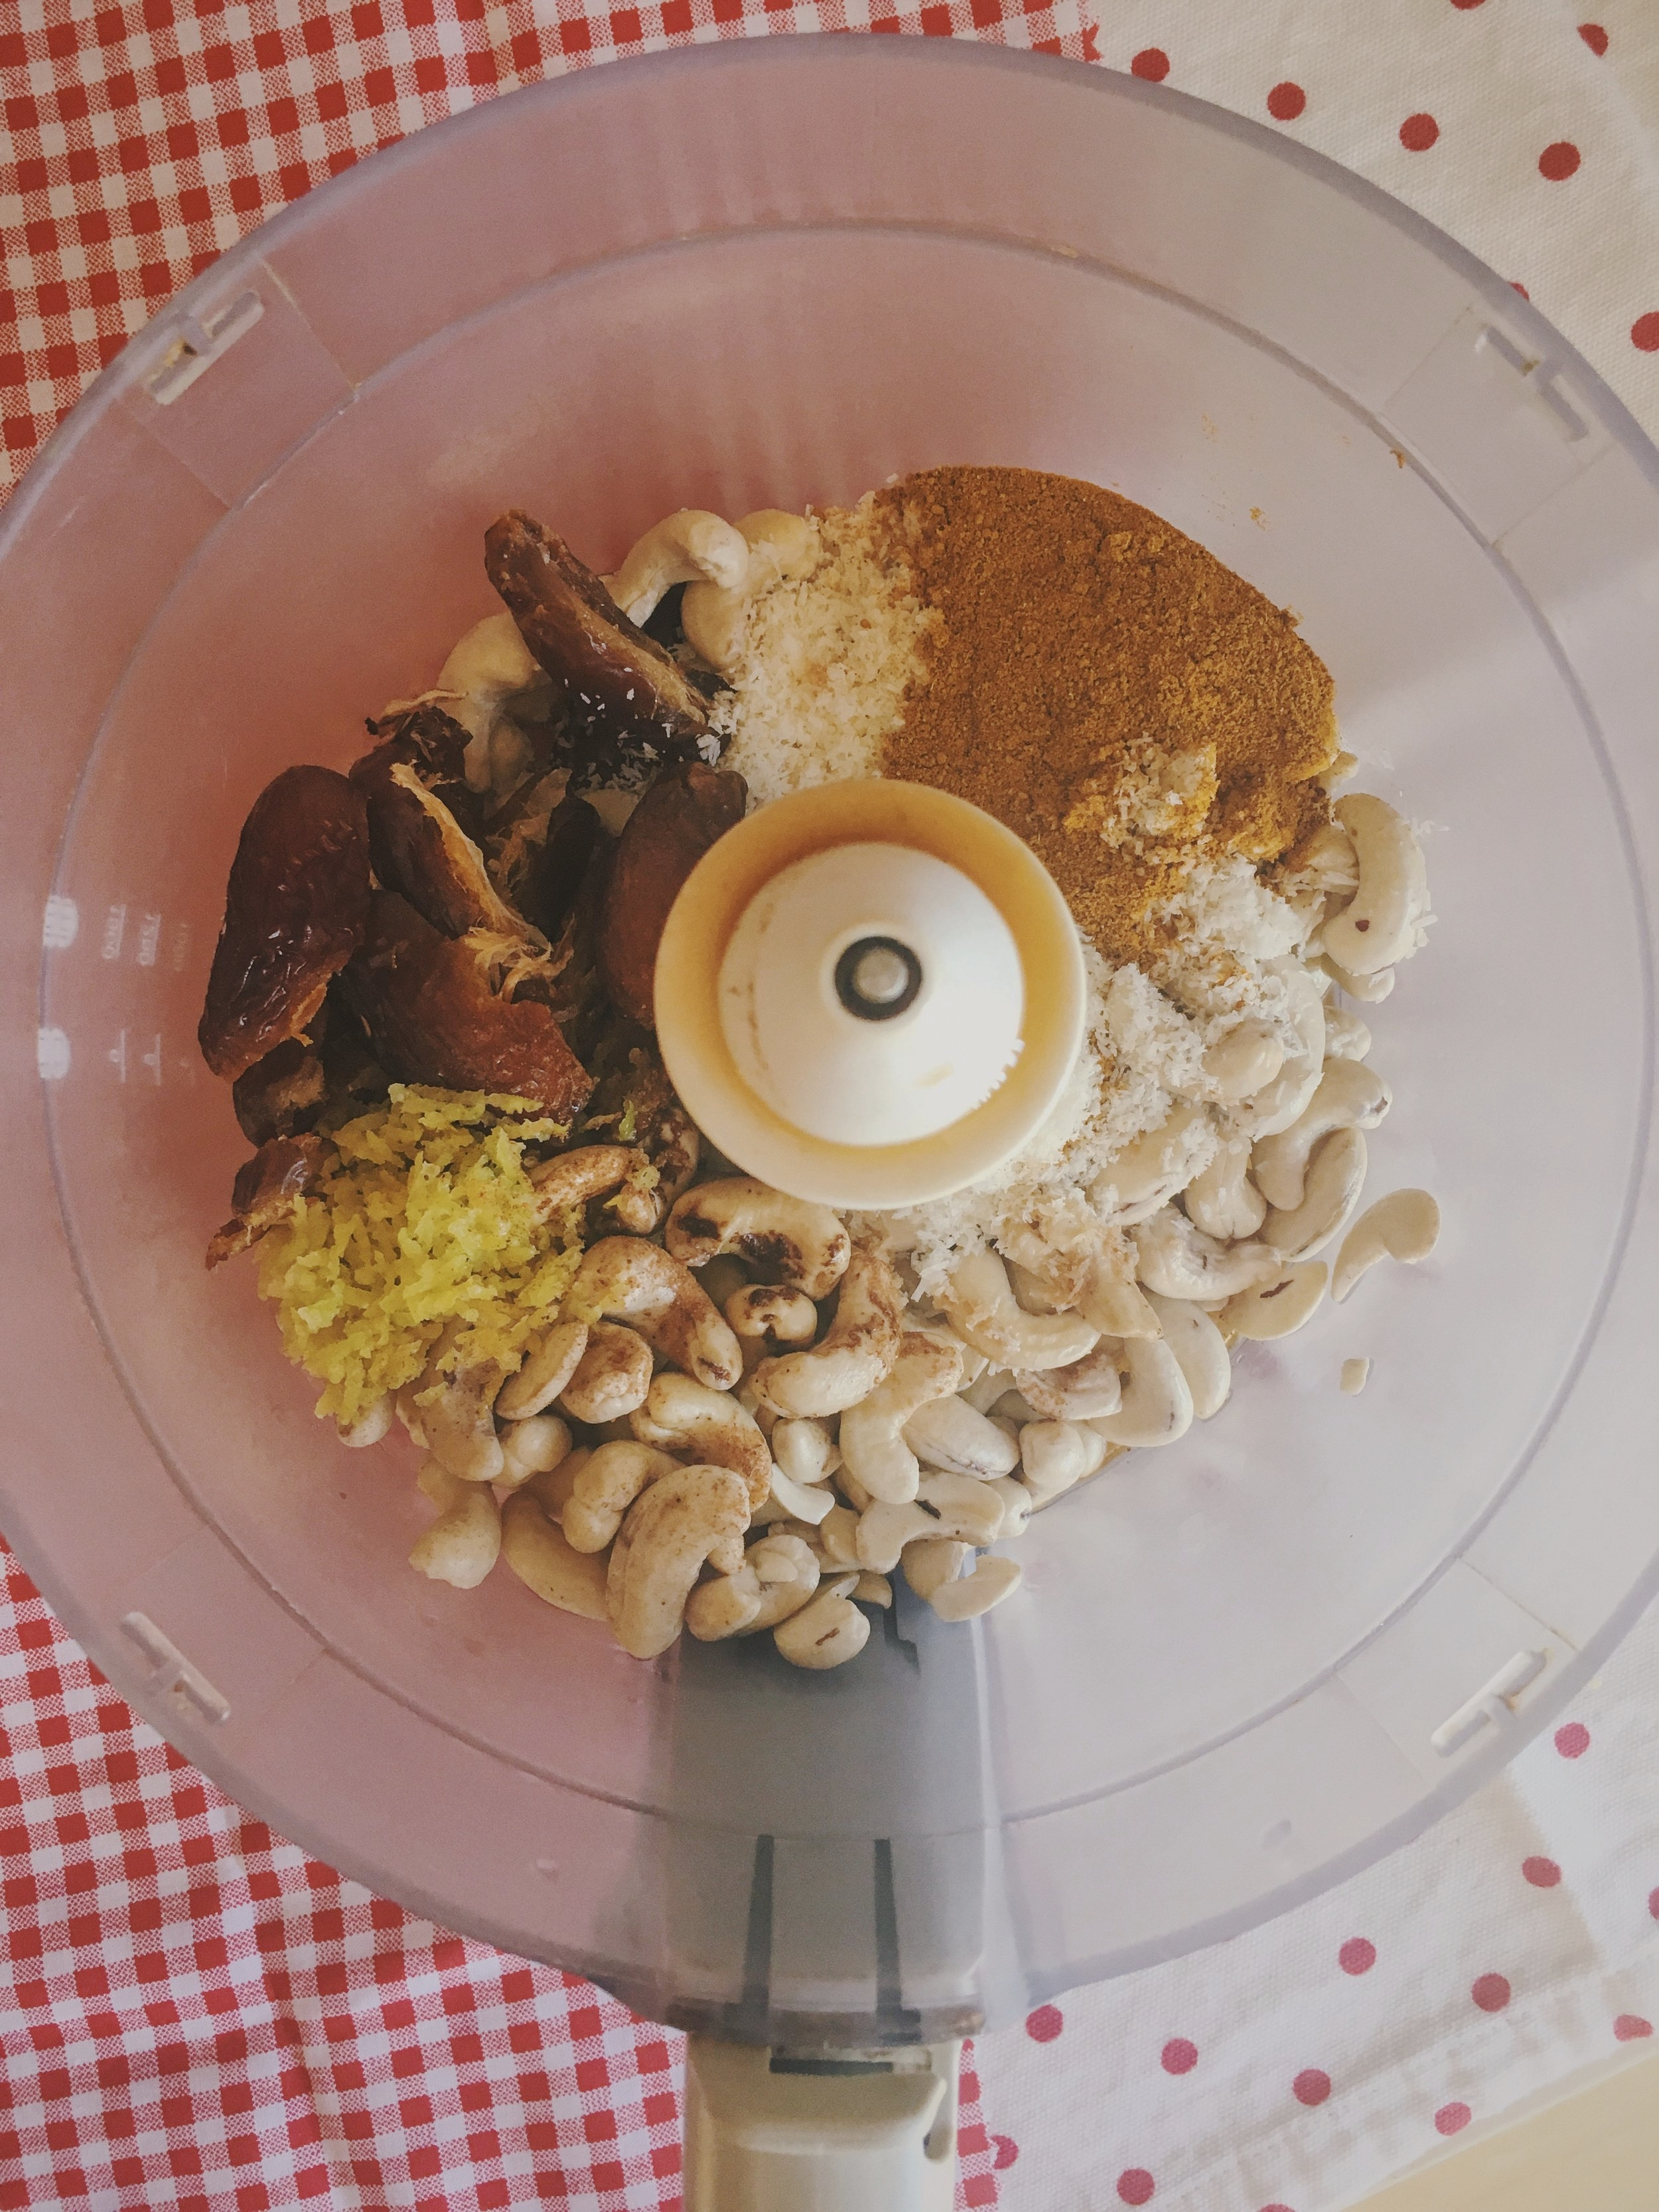 cashews, dates, lemon zest, cinnamon, coconut, turmeric in the food processor